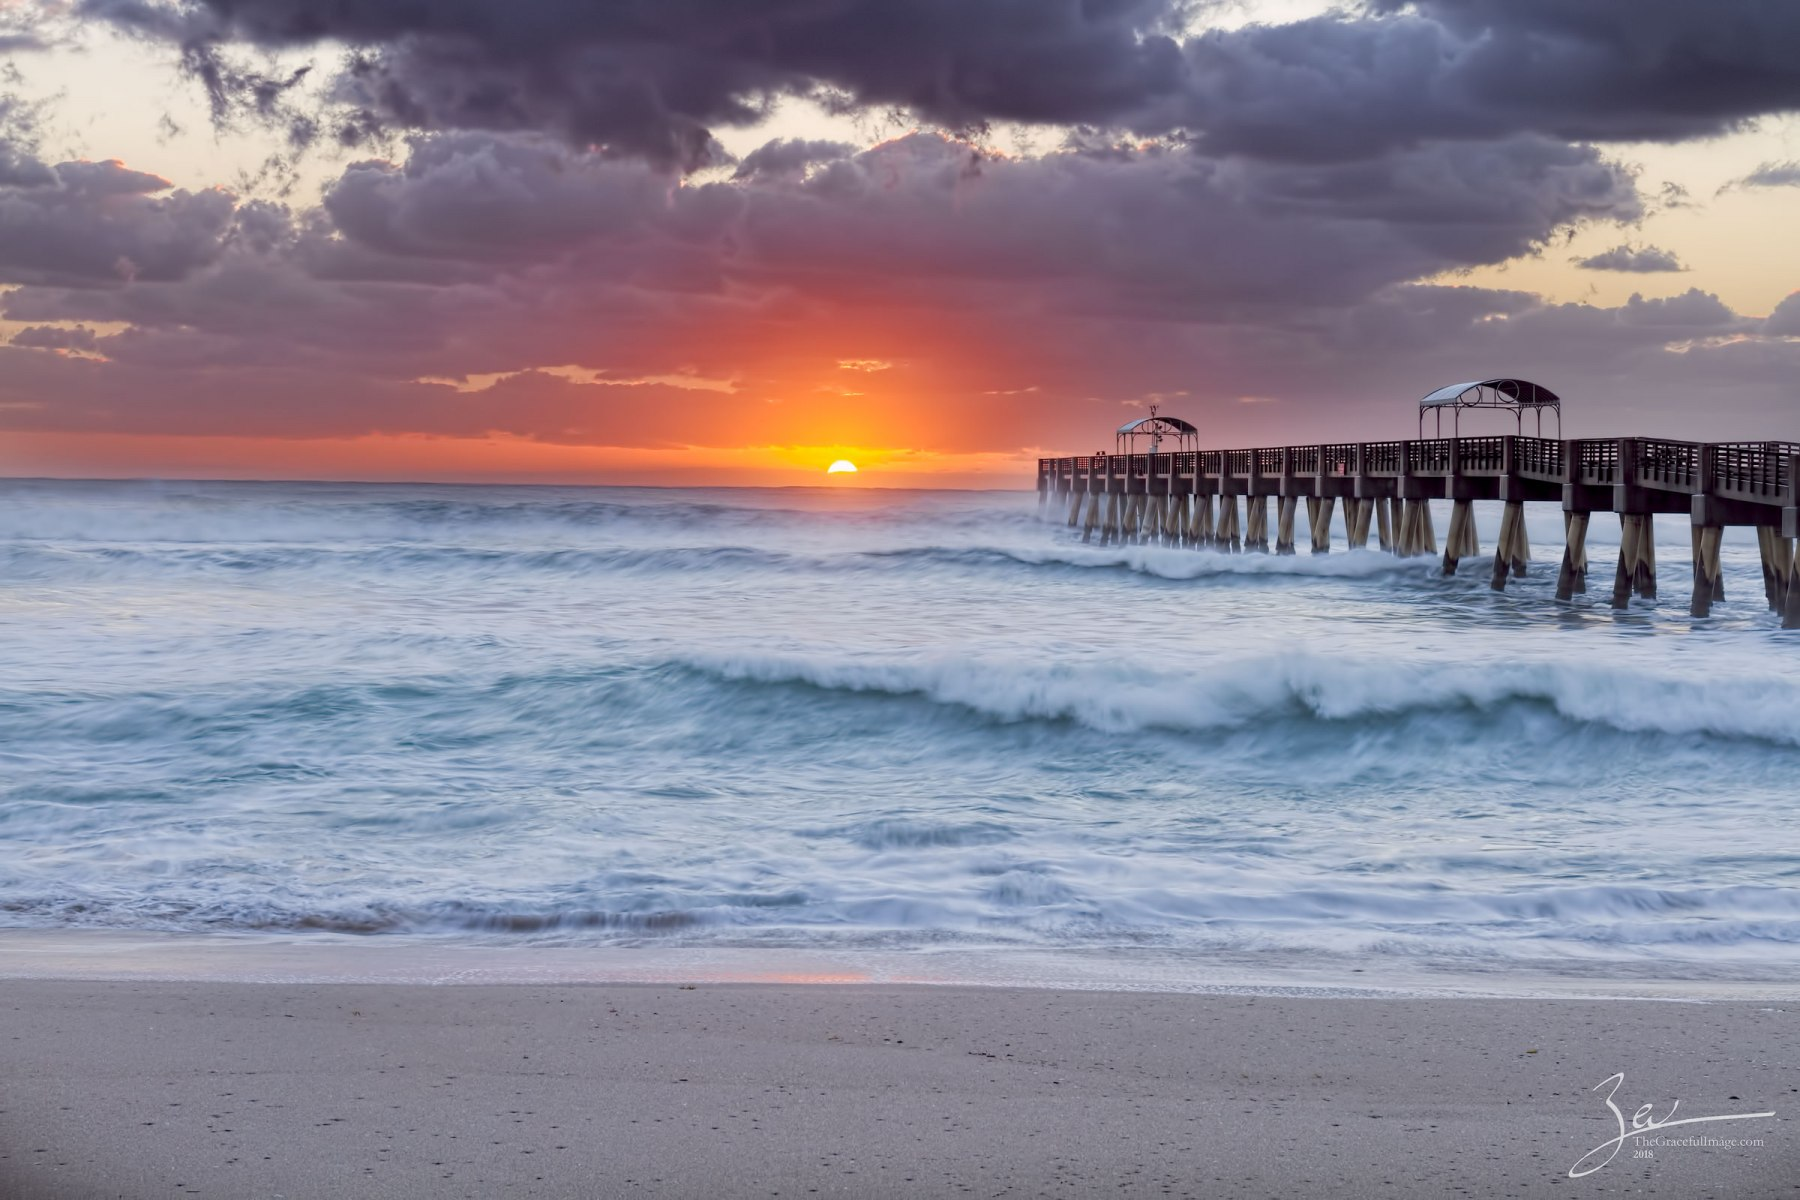 20180304_06_Florida_Trip-81_82-wm